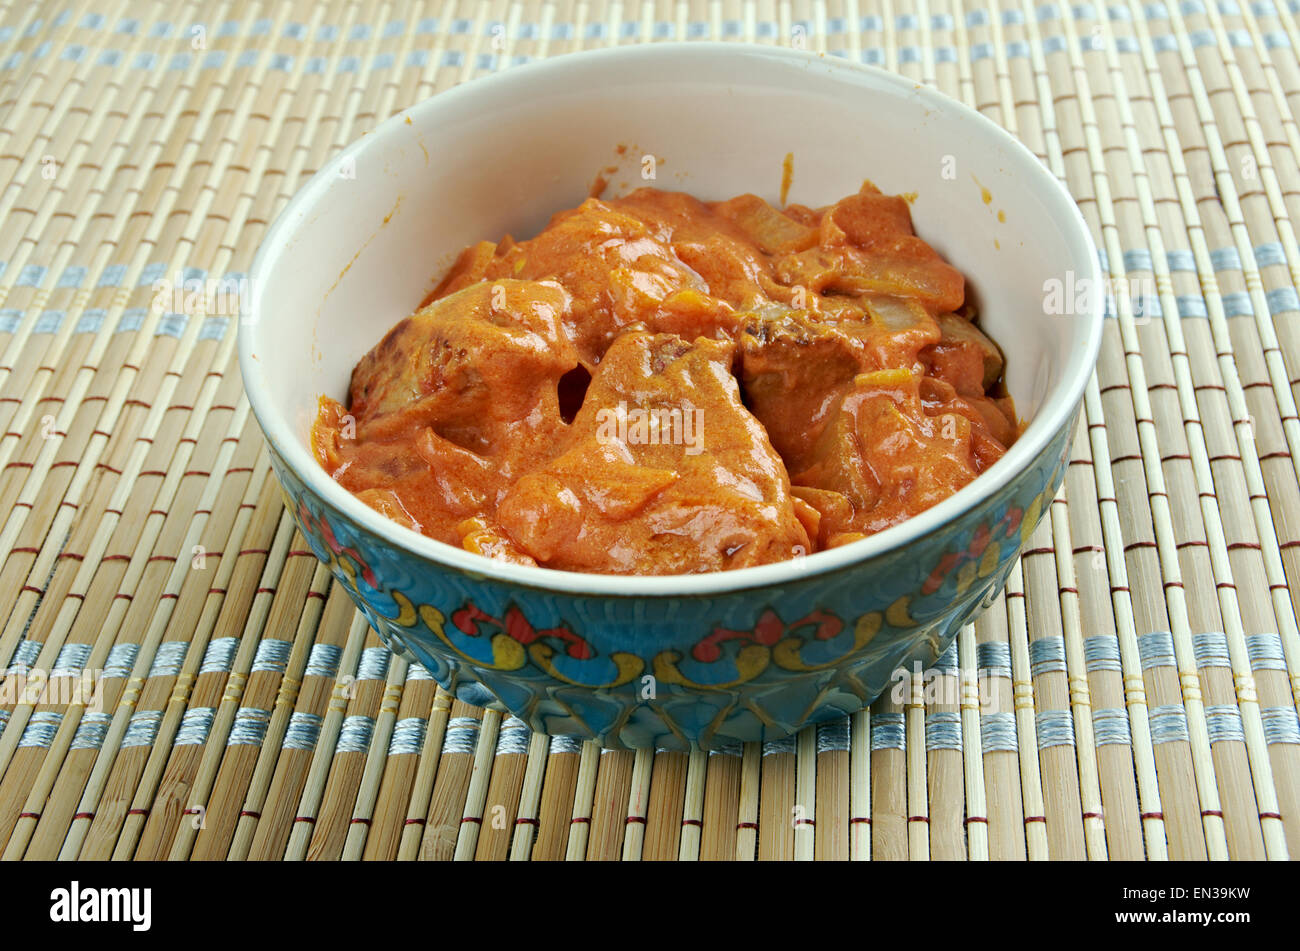 Lamb Rogan Josh - lamb dish of Persian origin, which is one of the signature recipes of Kashmiri cuisine. - Stock Image